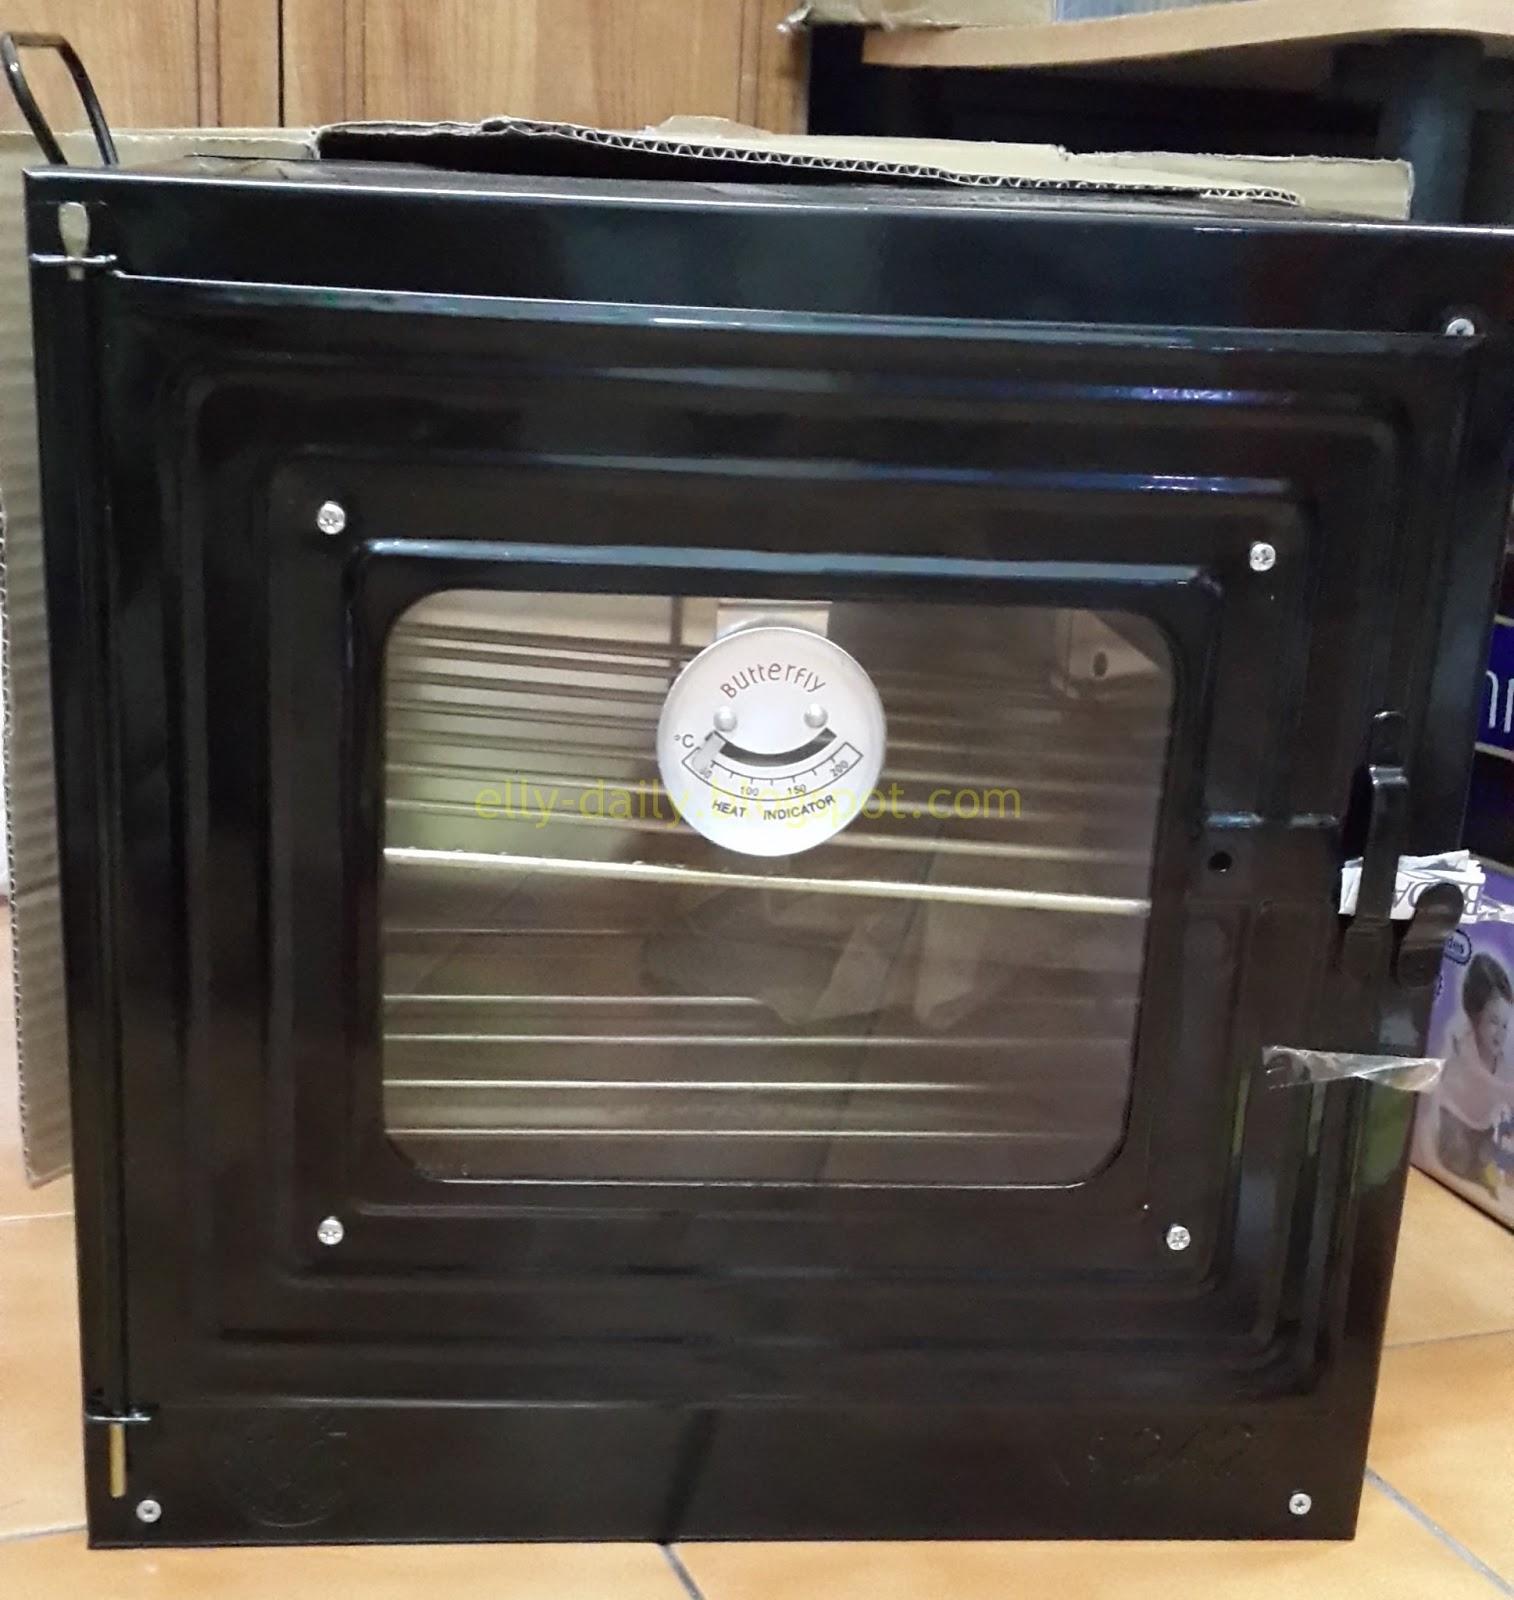 Oven Dapur Gas Biar Desainrumahid Erfly